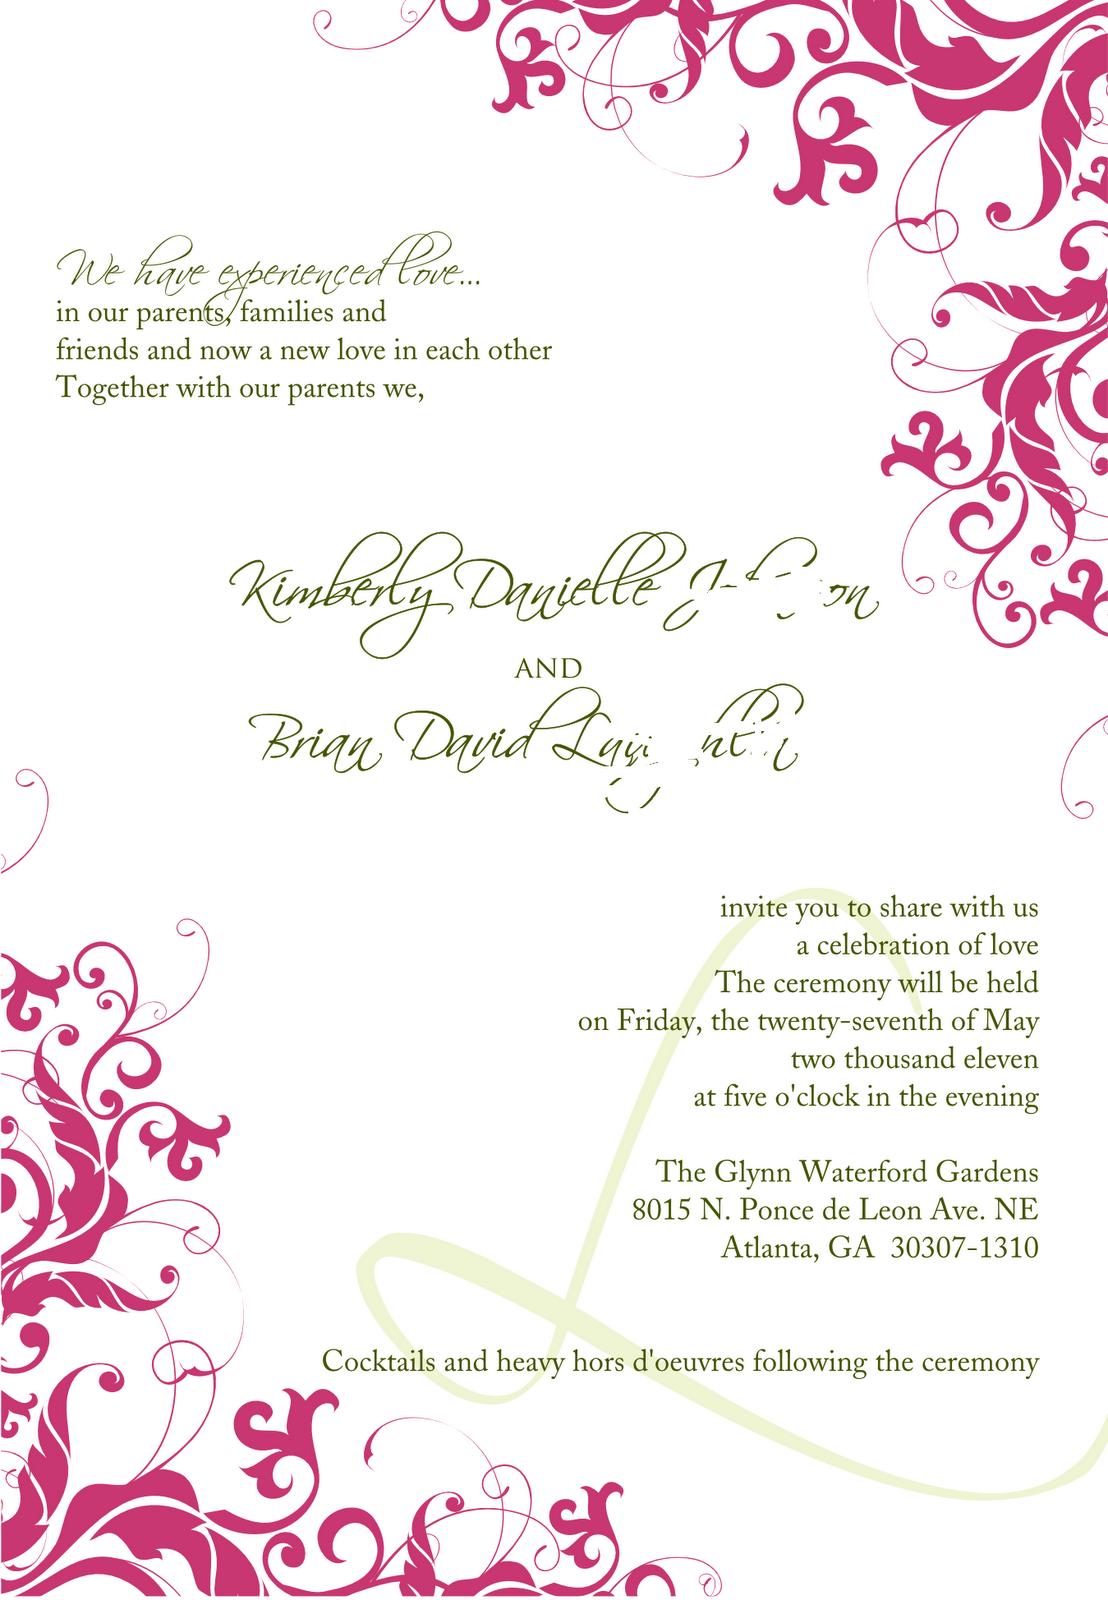 Wedding Invitation Design Png